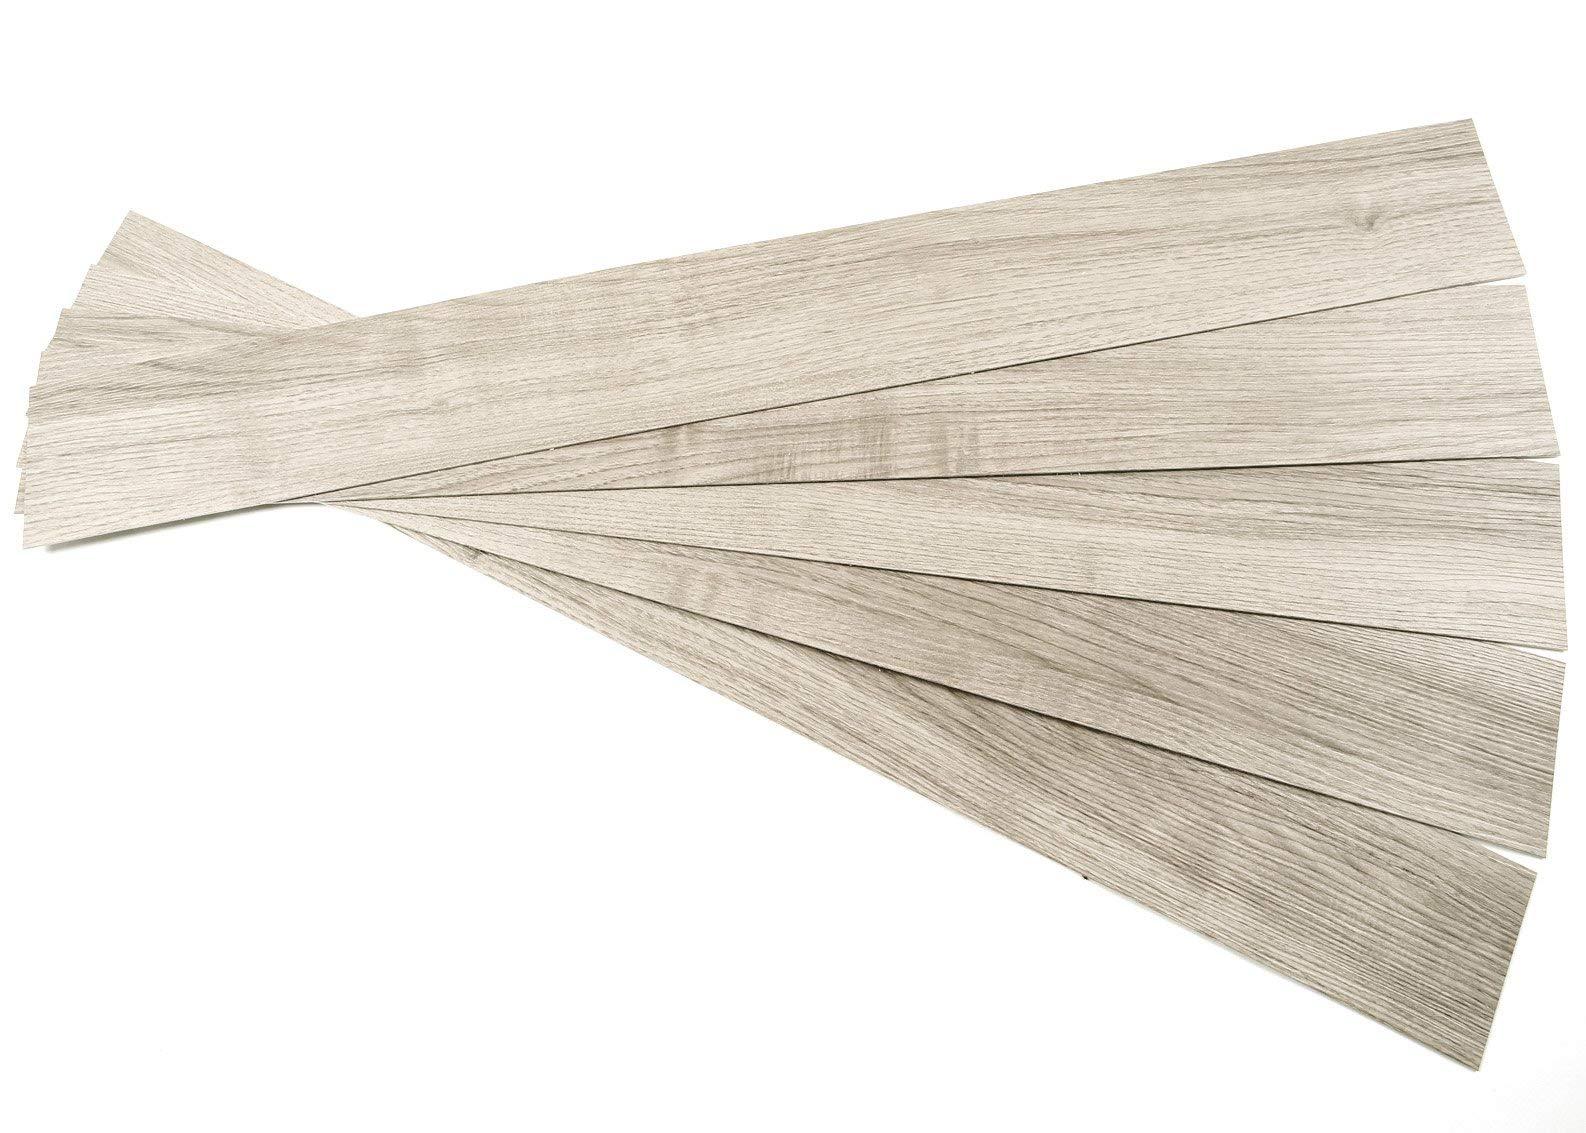 ROSEROSA Peel and Stick Engineered Vinyl Plank and Square Tiles Marble Carpet Stone Concrete Pattern Durable Vinyl Flooring (ECK-705 : 5 Planks)